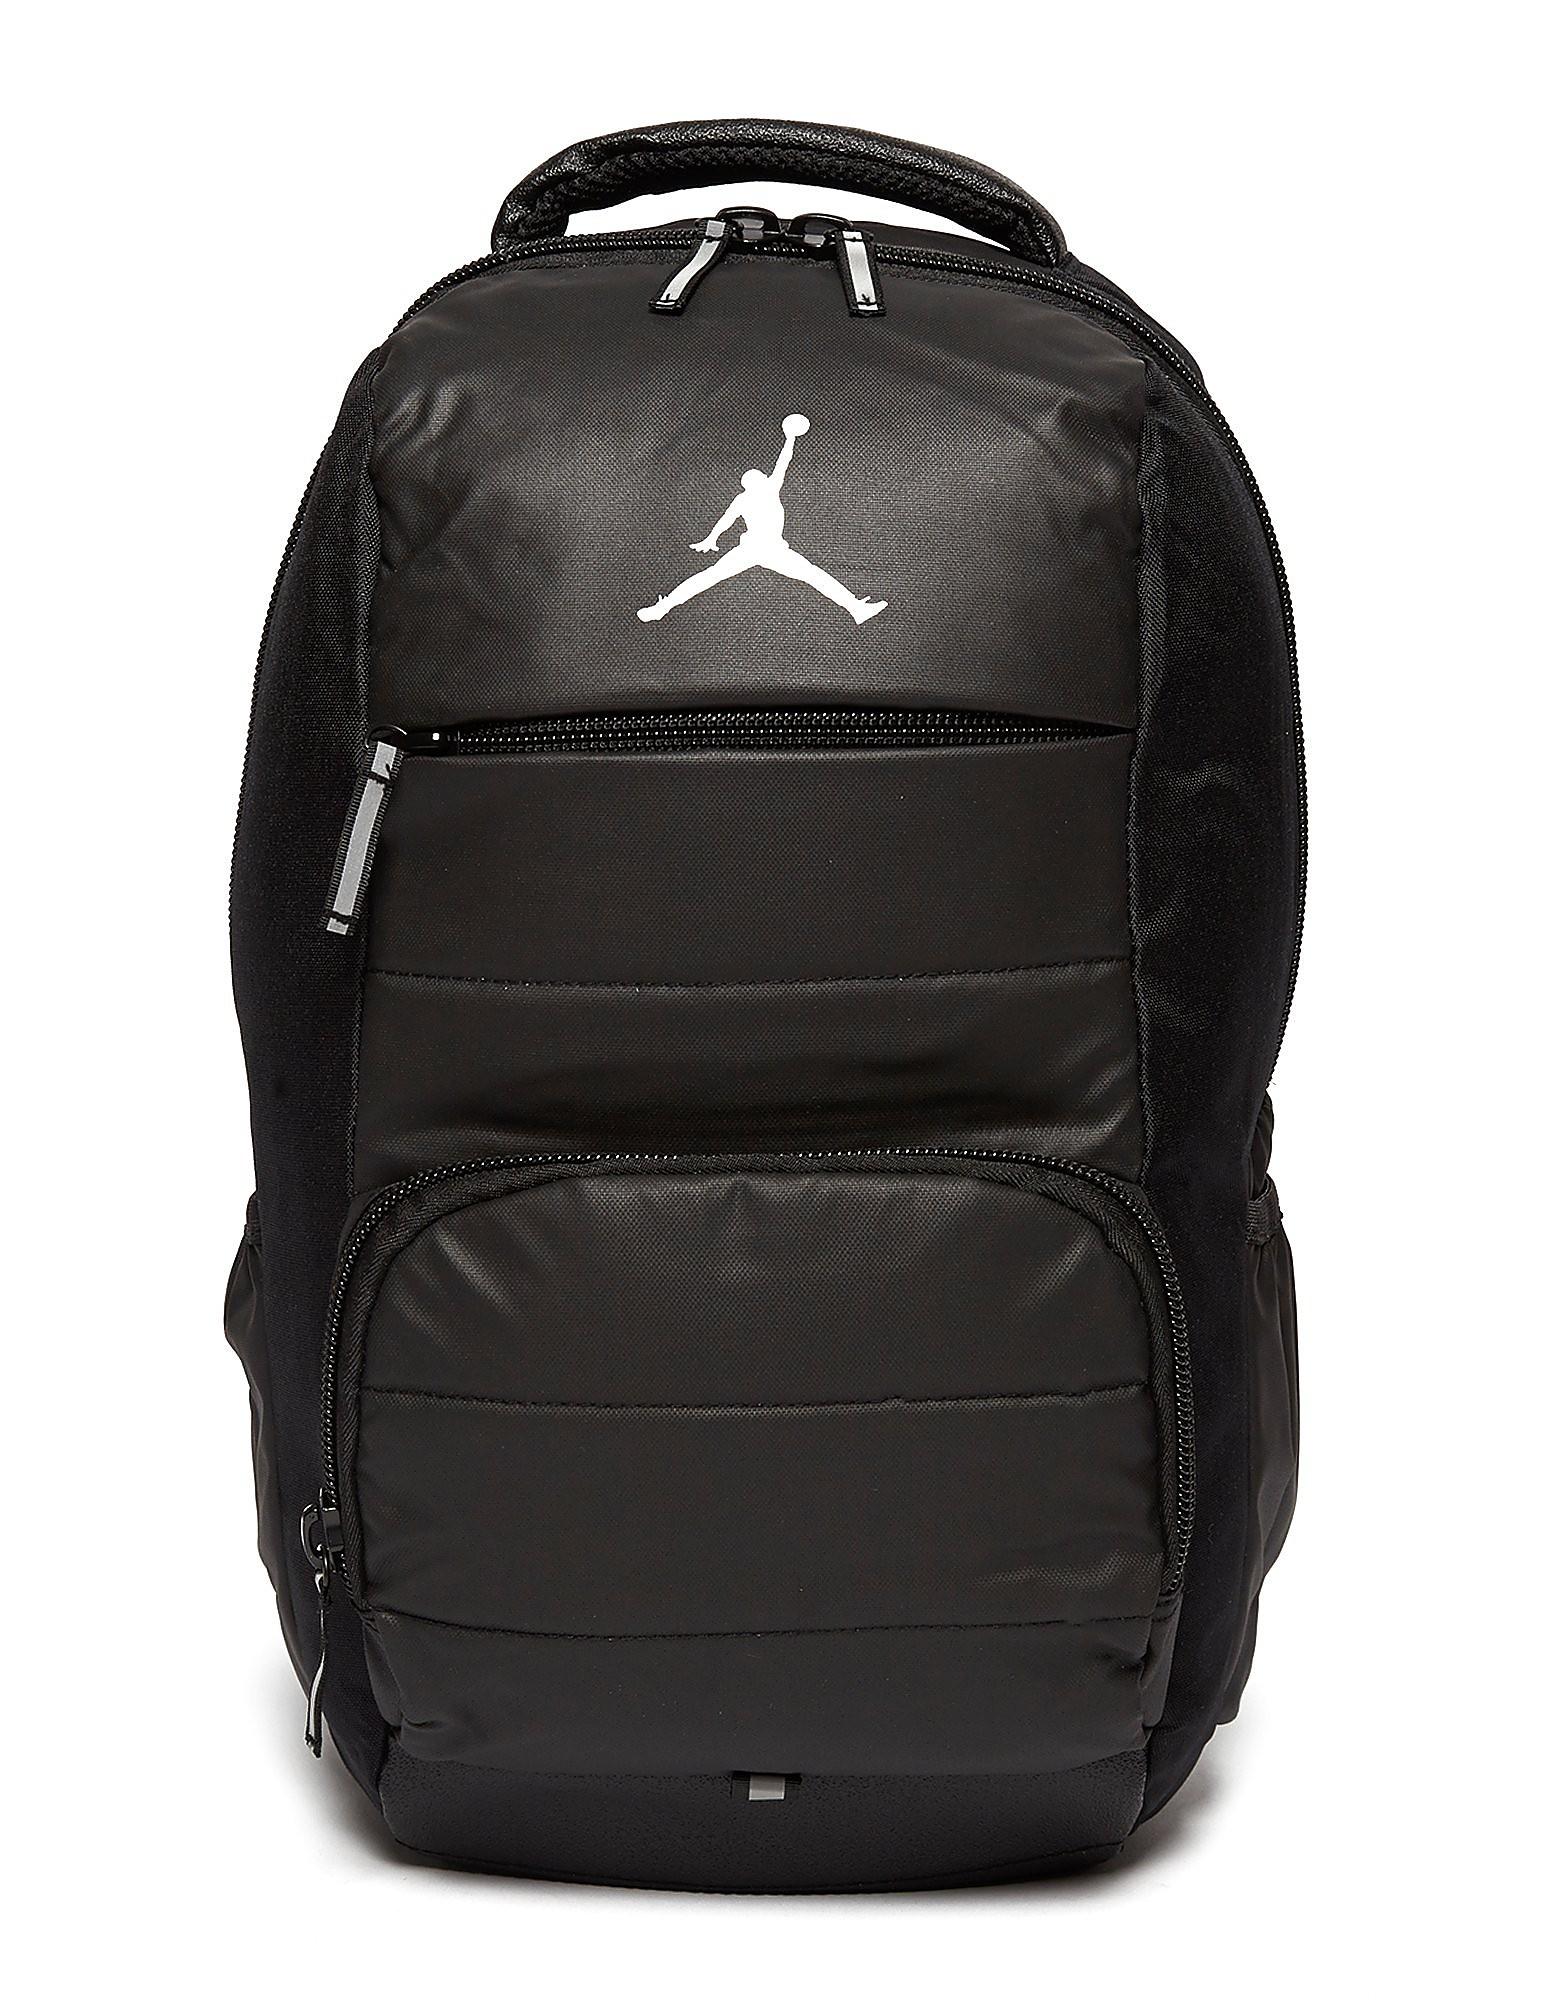 Jordan All World Rucksack